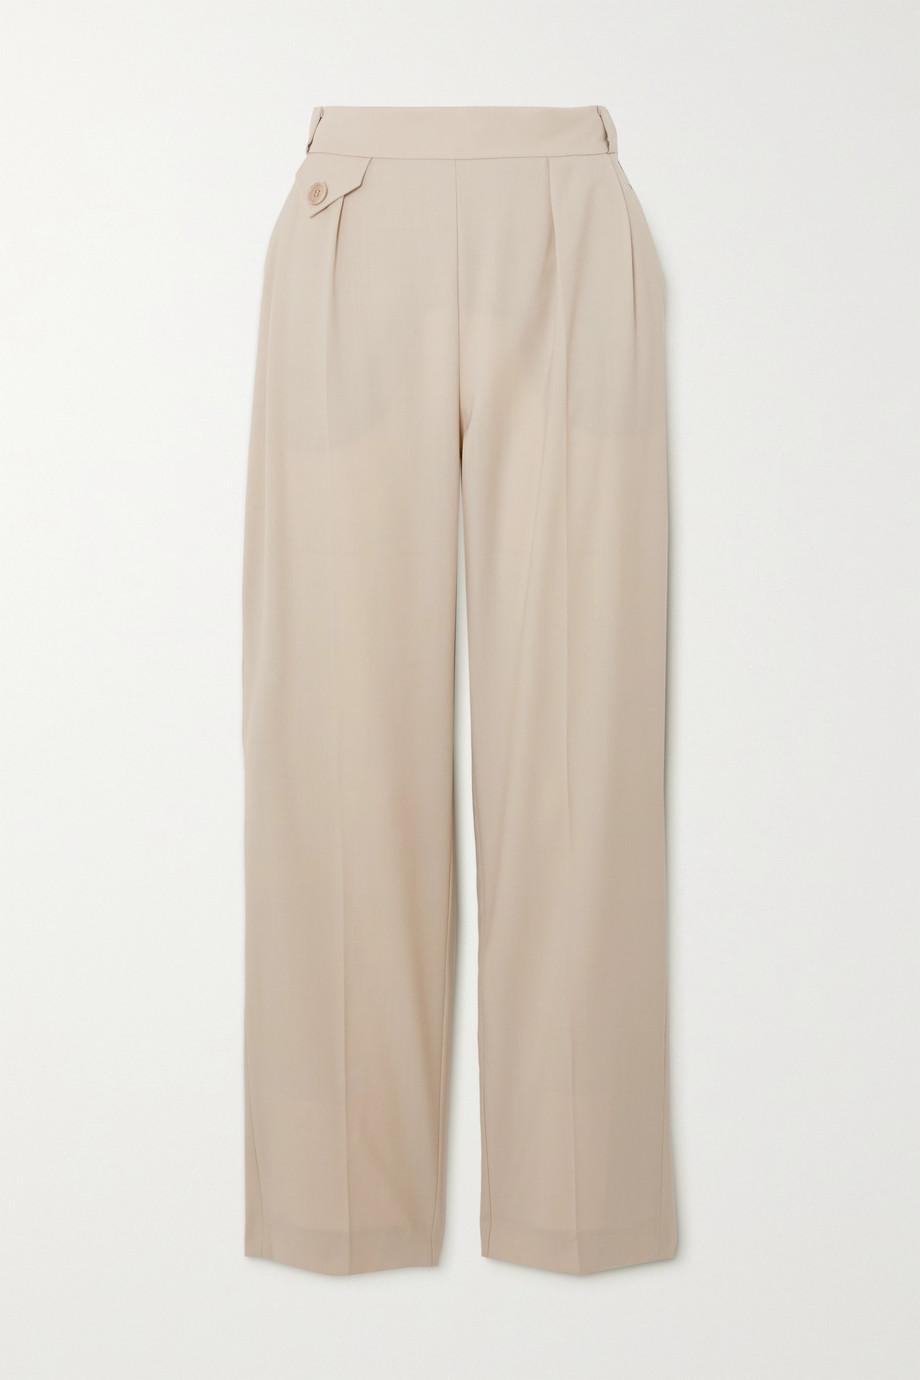 Envelope1976 Marias wool tapered pants